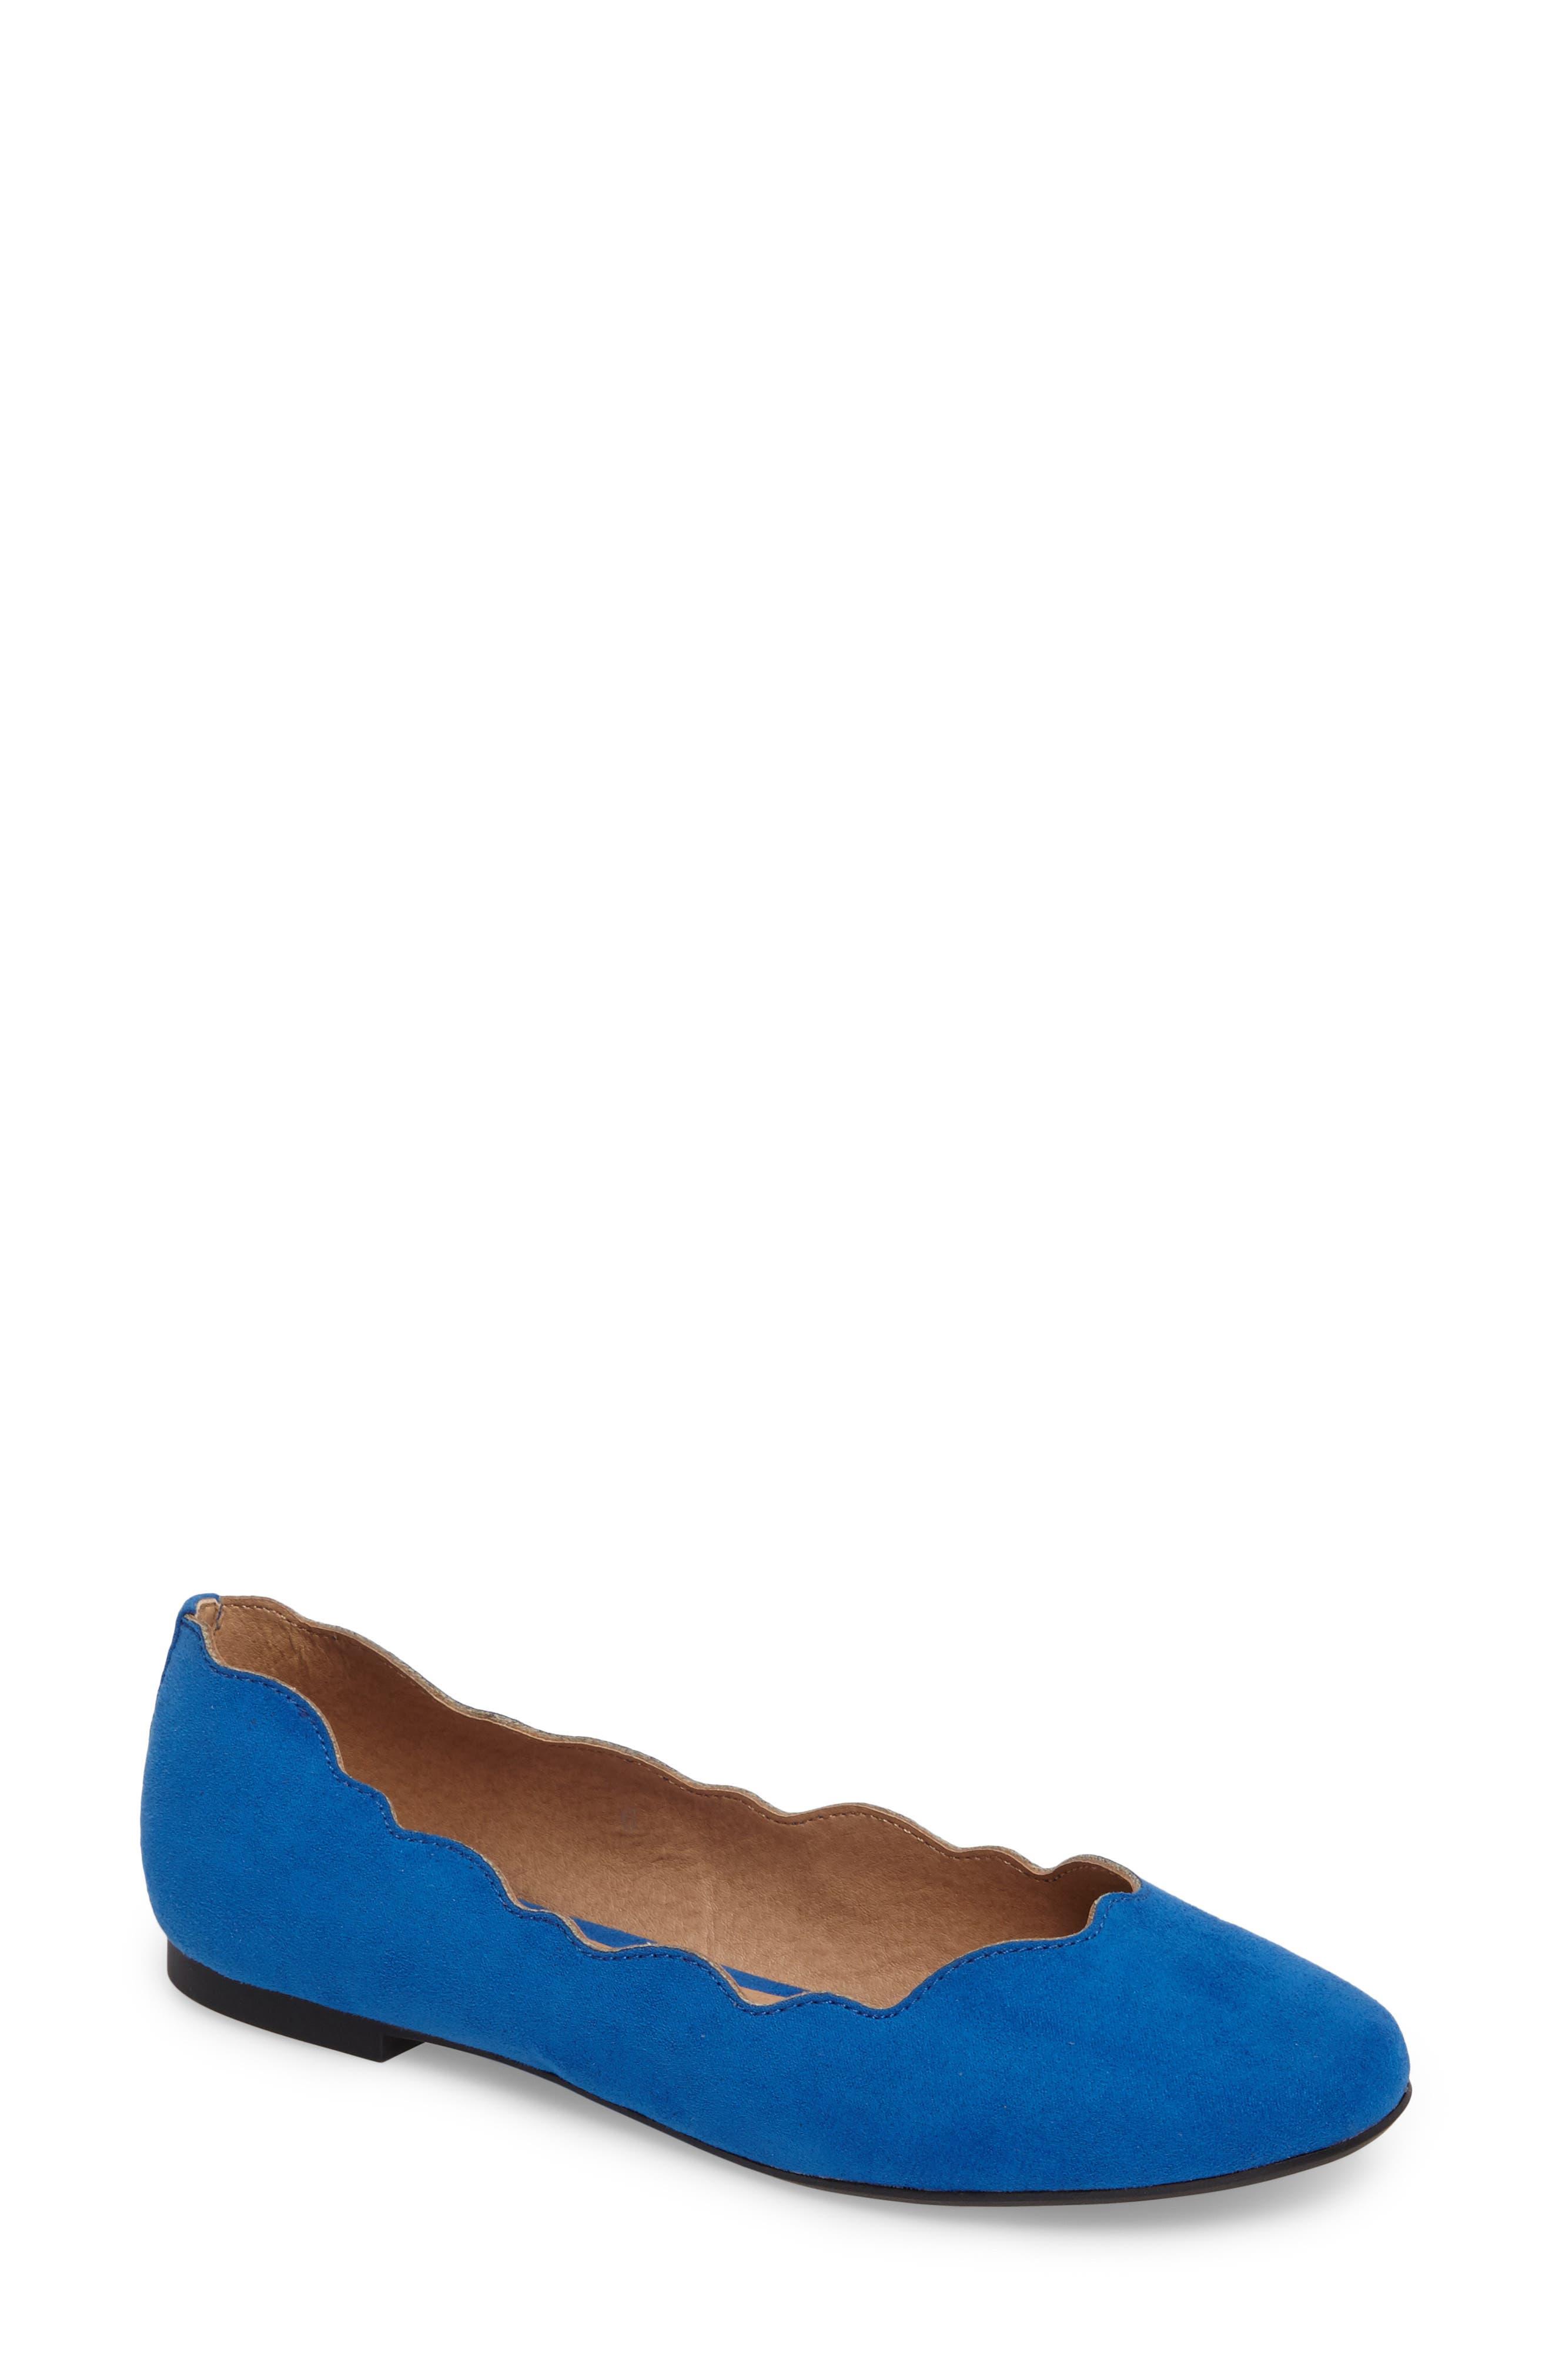 Tallye Ballet Flat,                             Main thumbnail 1, color,                             Royal Blue Faux Suede